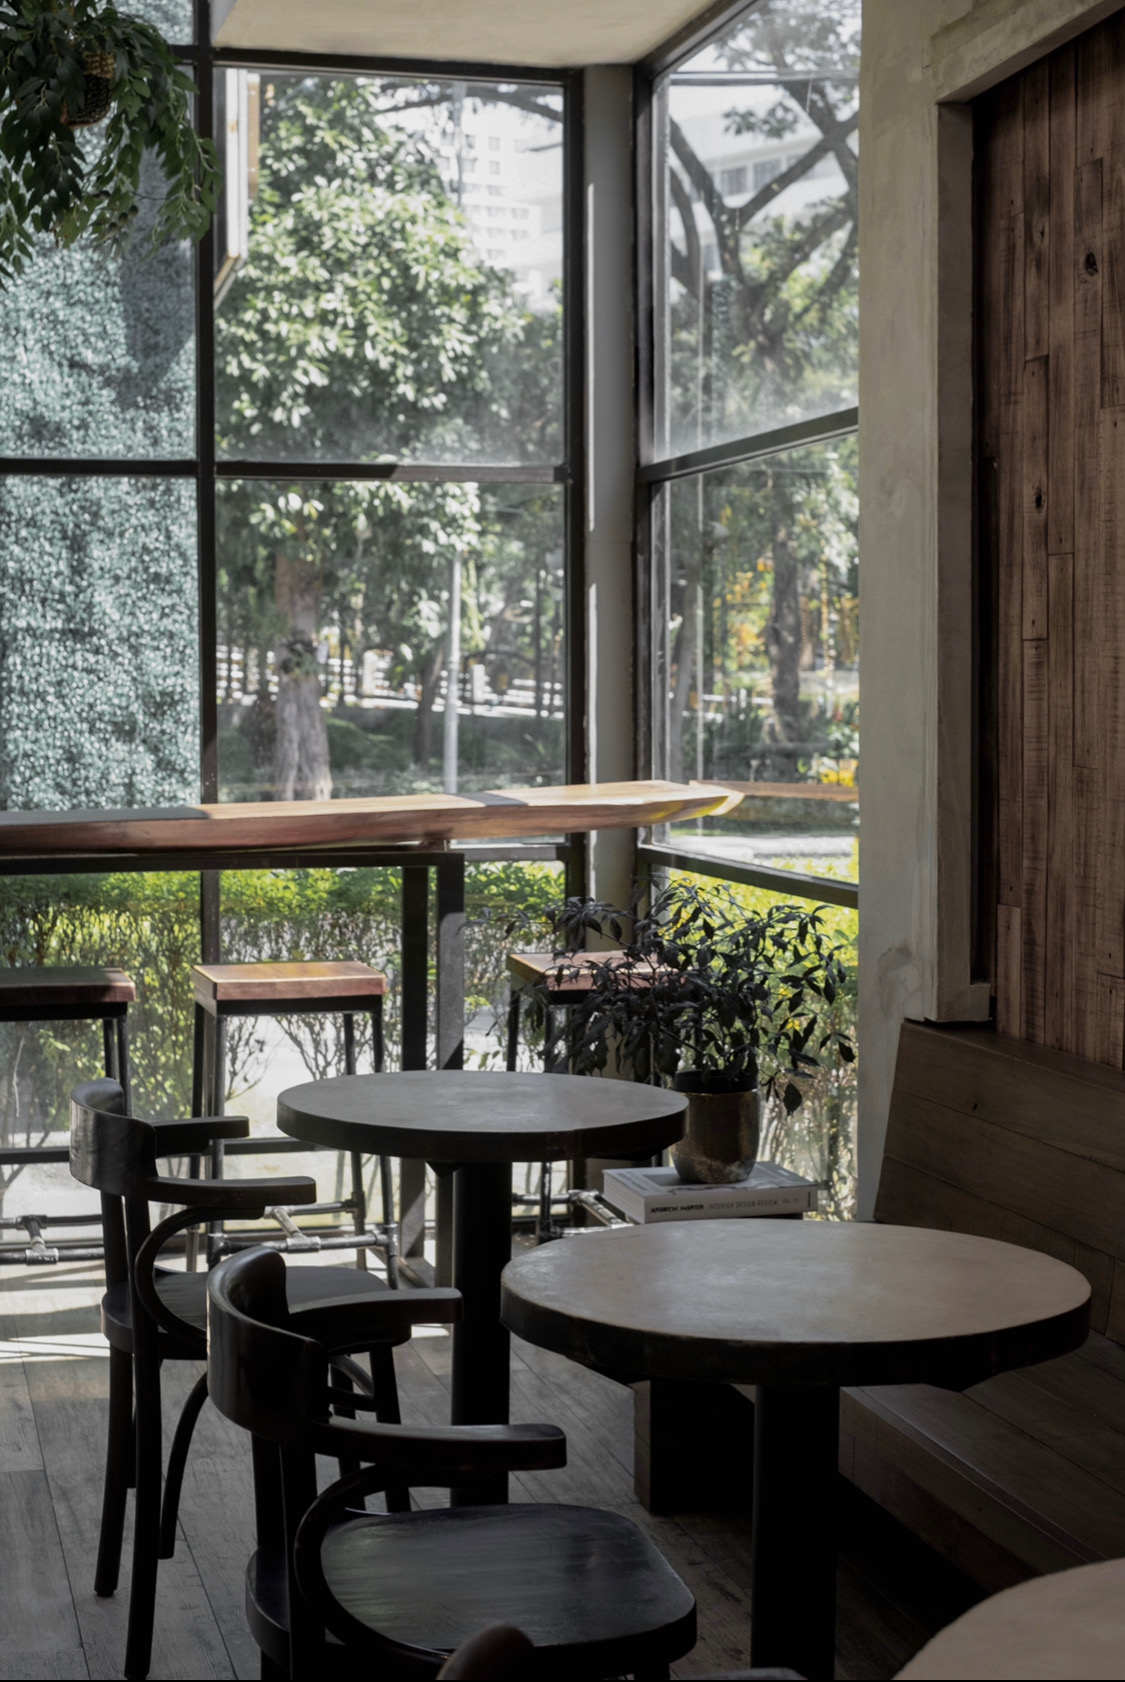 Menikmati Suasana Nyaman di Calibre Coffee Roasters Surabaya